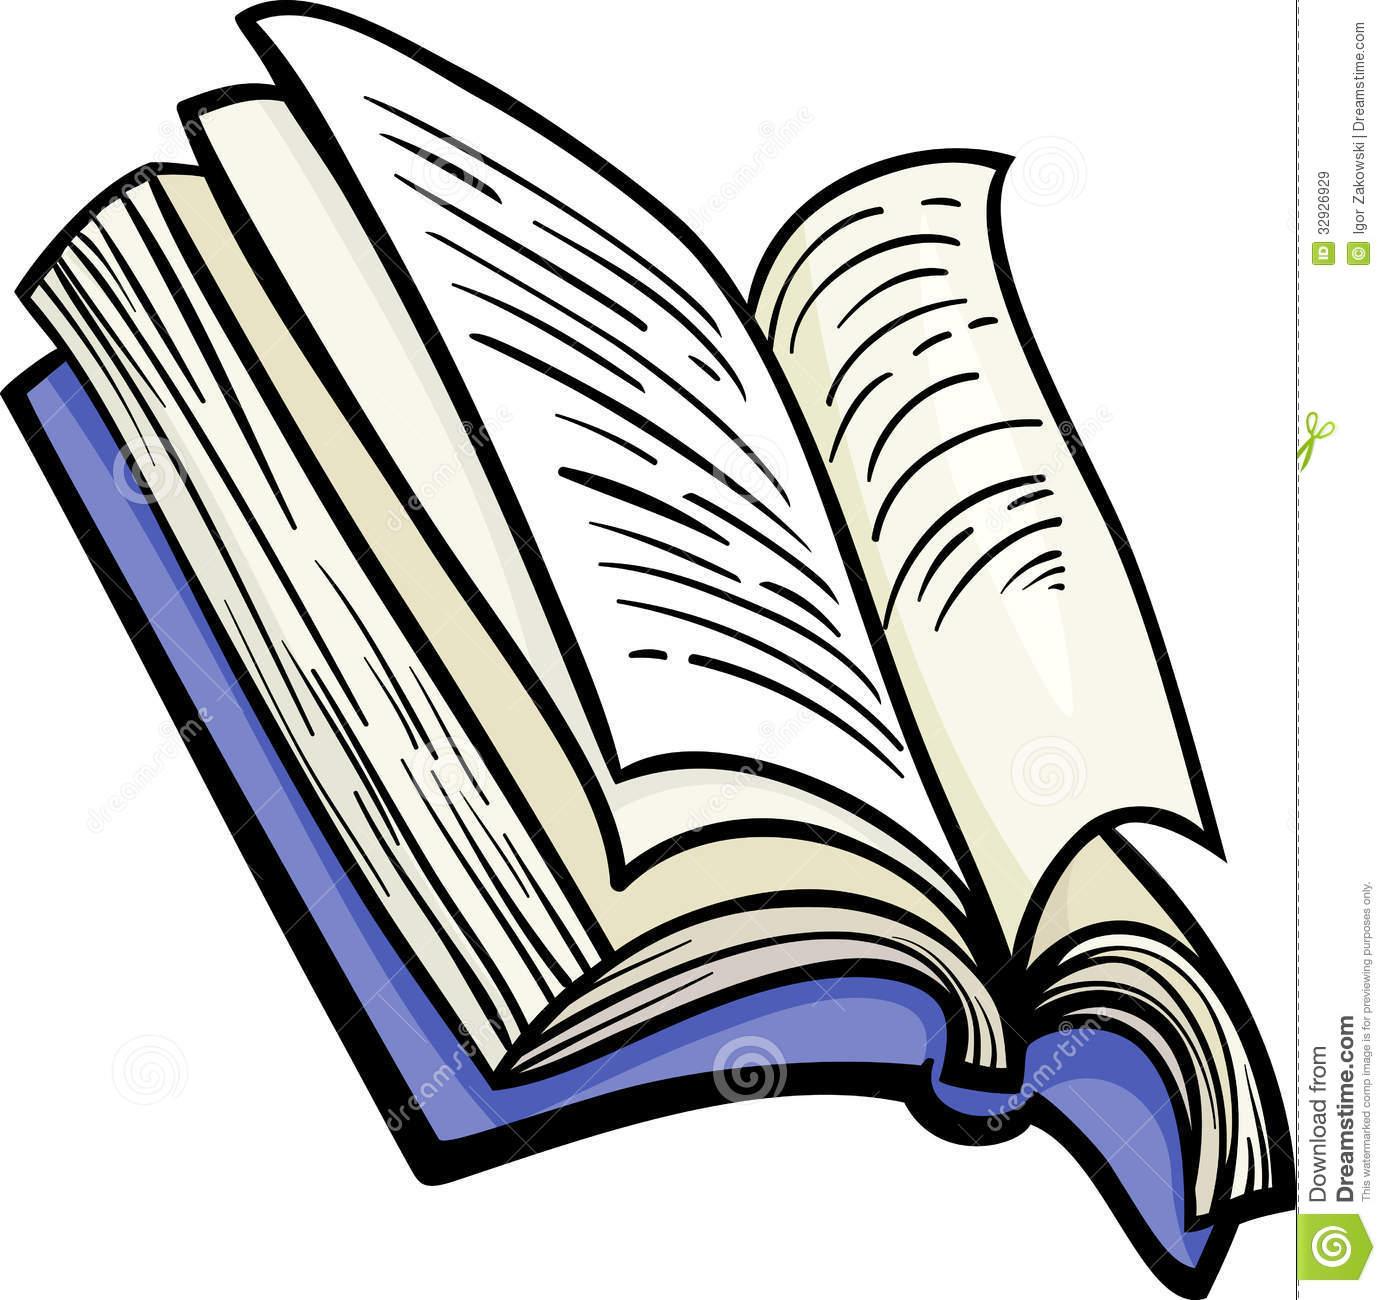 Cartoon book picture clipart clip art free download Free Cartoon Books Images, Download Free Clip Art, Free Clip Art on ... clip art free download